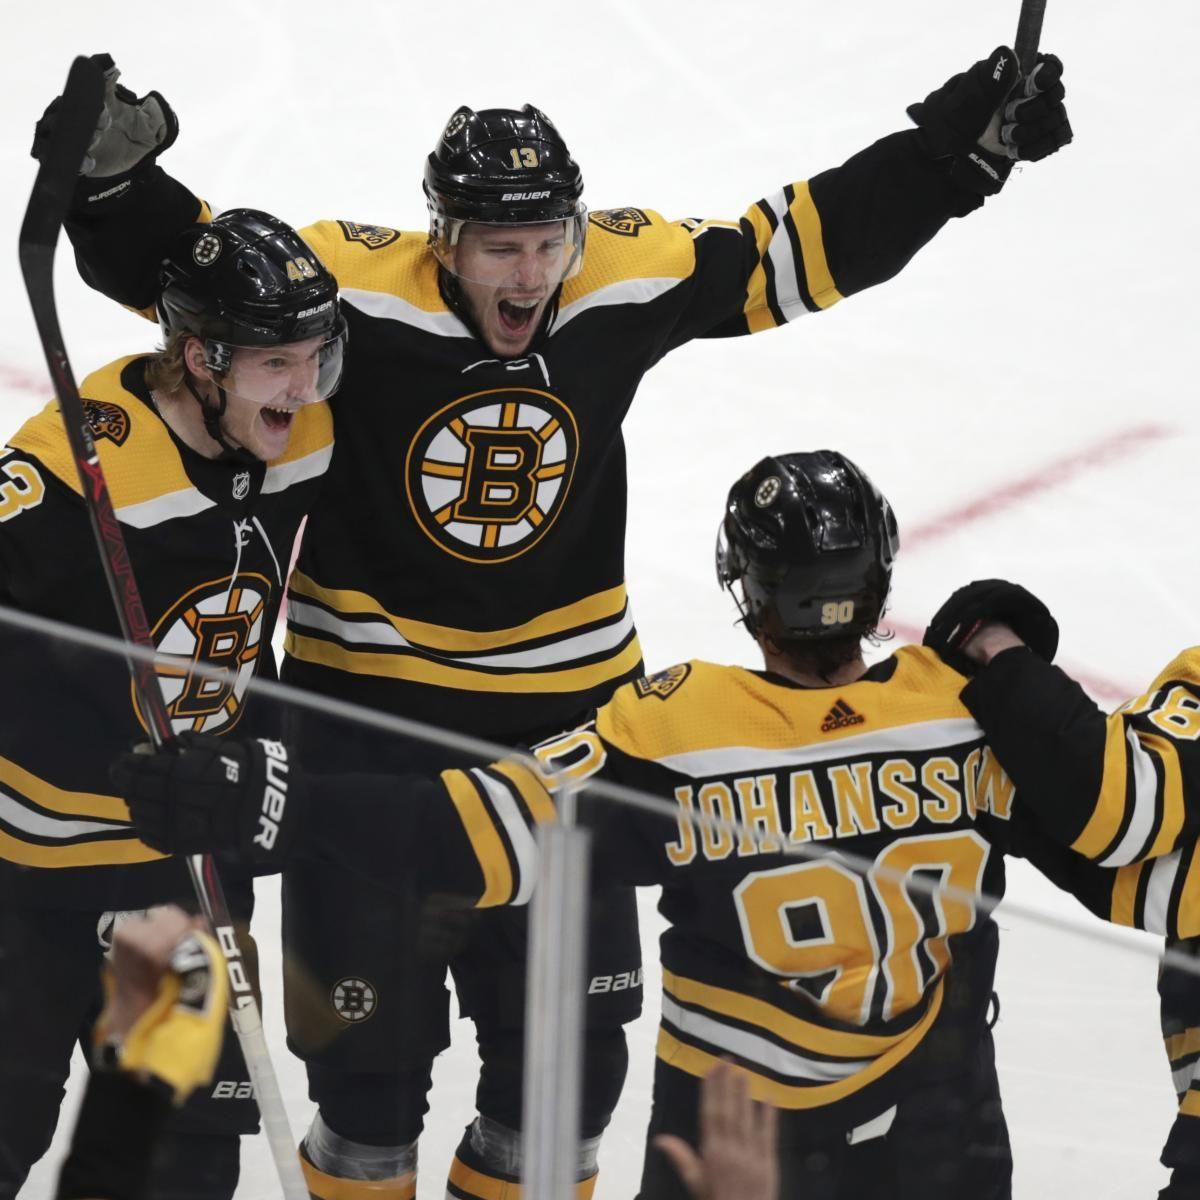 NHL Playoff Bracket 2019 Full Weekend TV and LiveStream